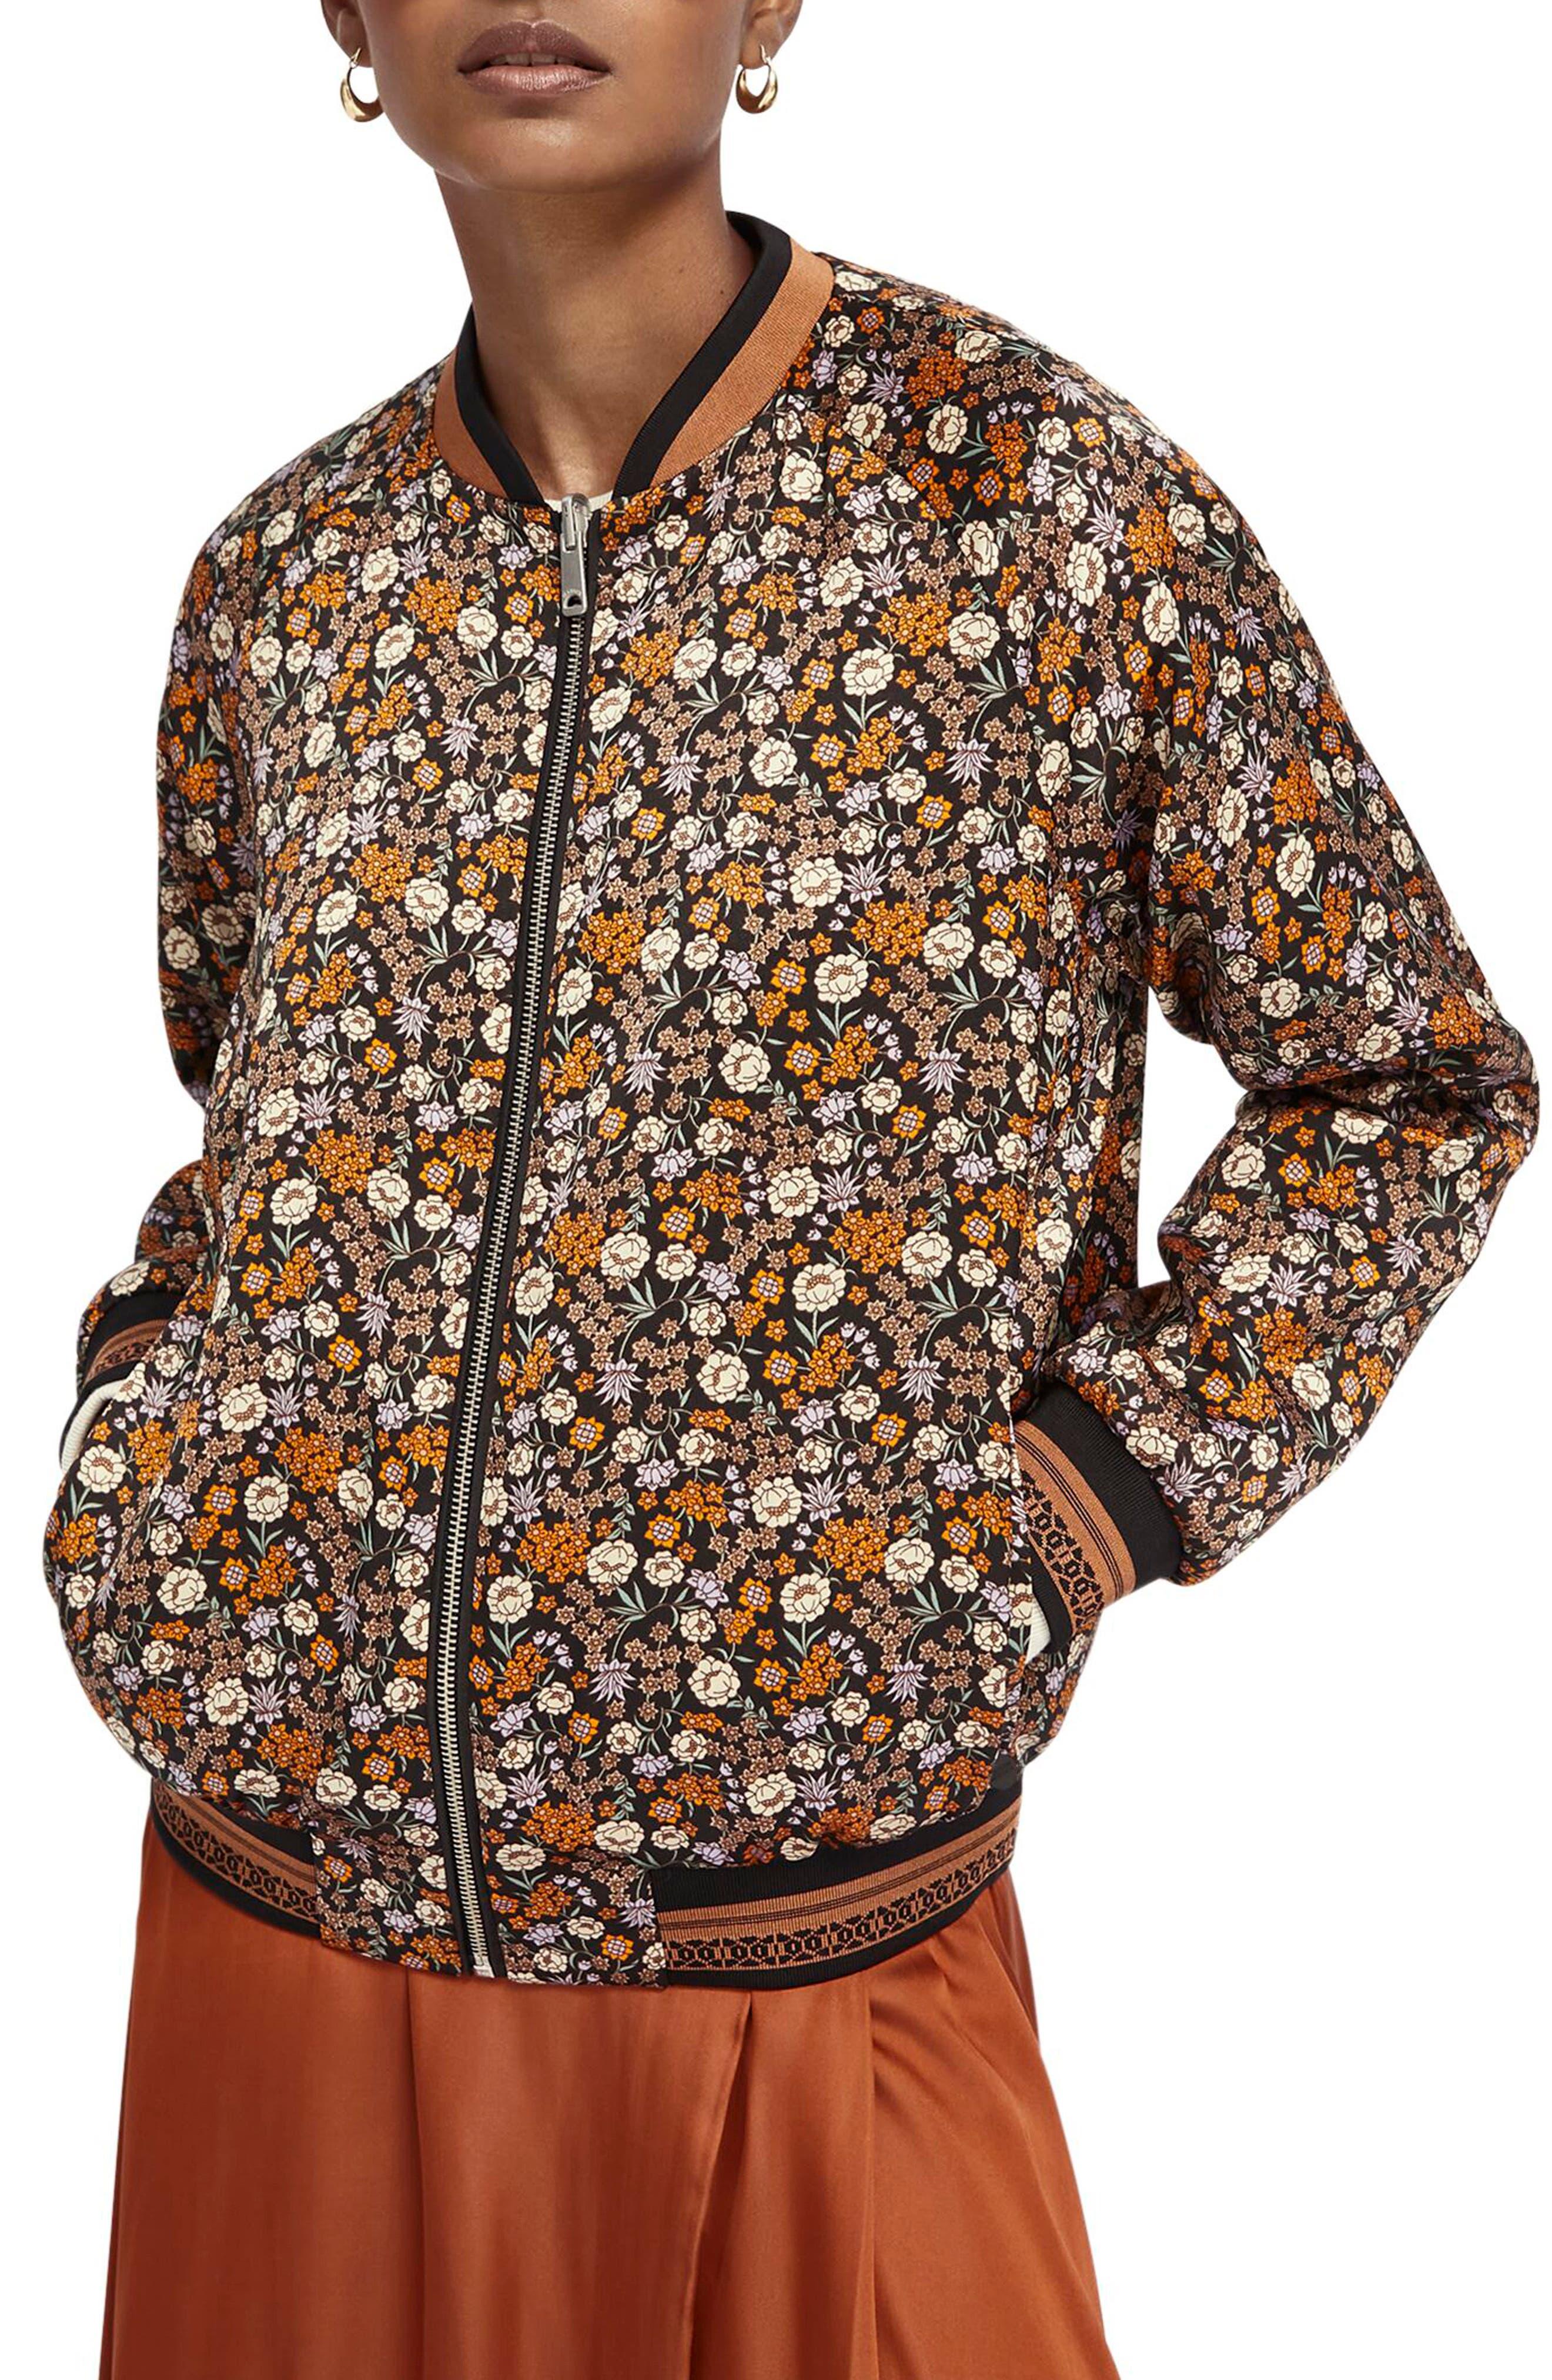 Vintage Coats & Jackets | Retro Coats and Jackets Womens Scotch  Soda Reversible Bomber Jacket $159.00 AT vintagedancer.com